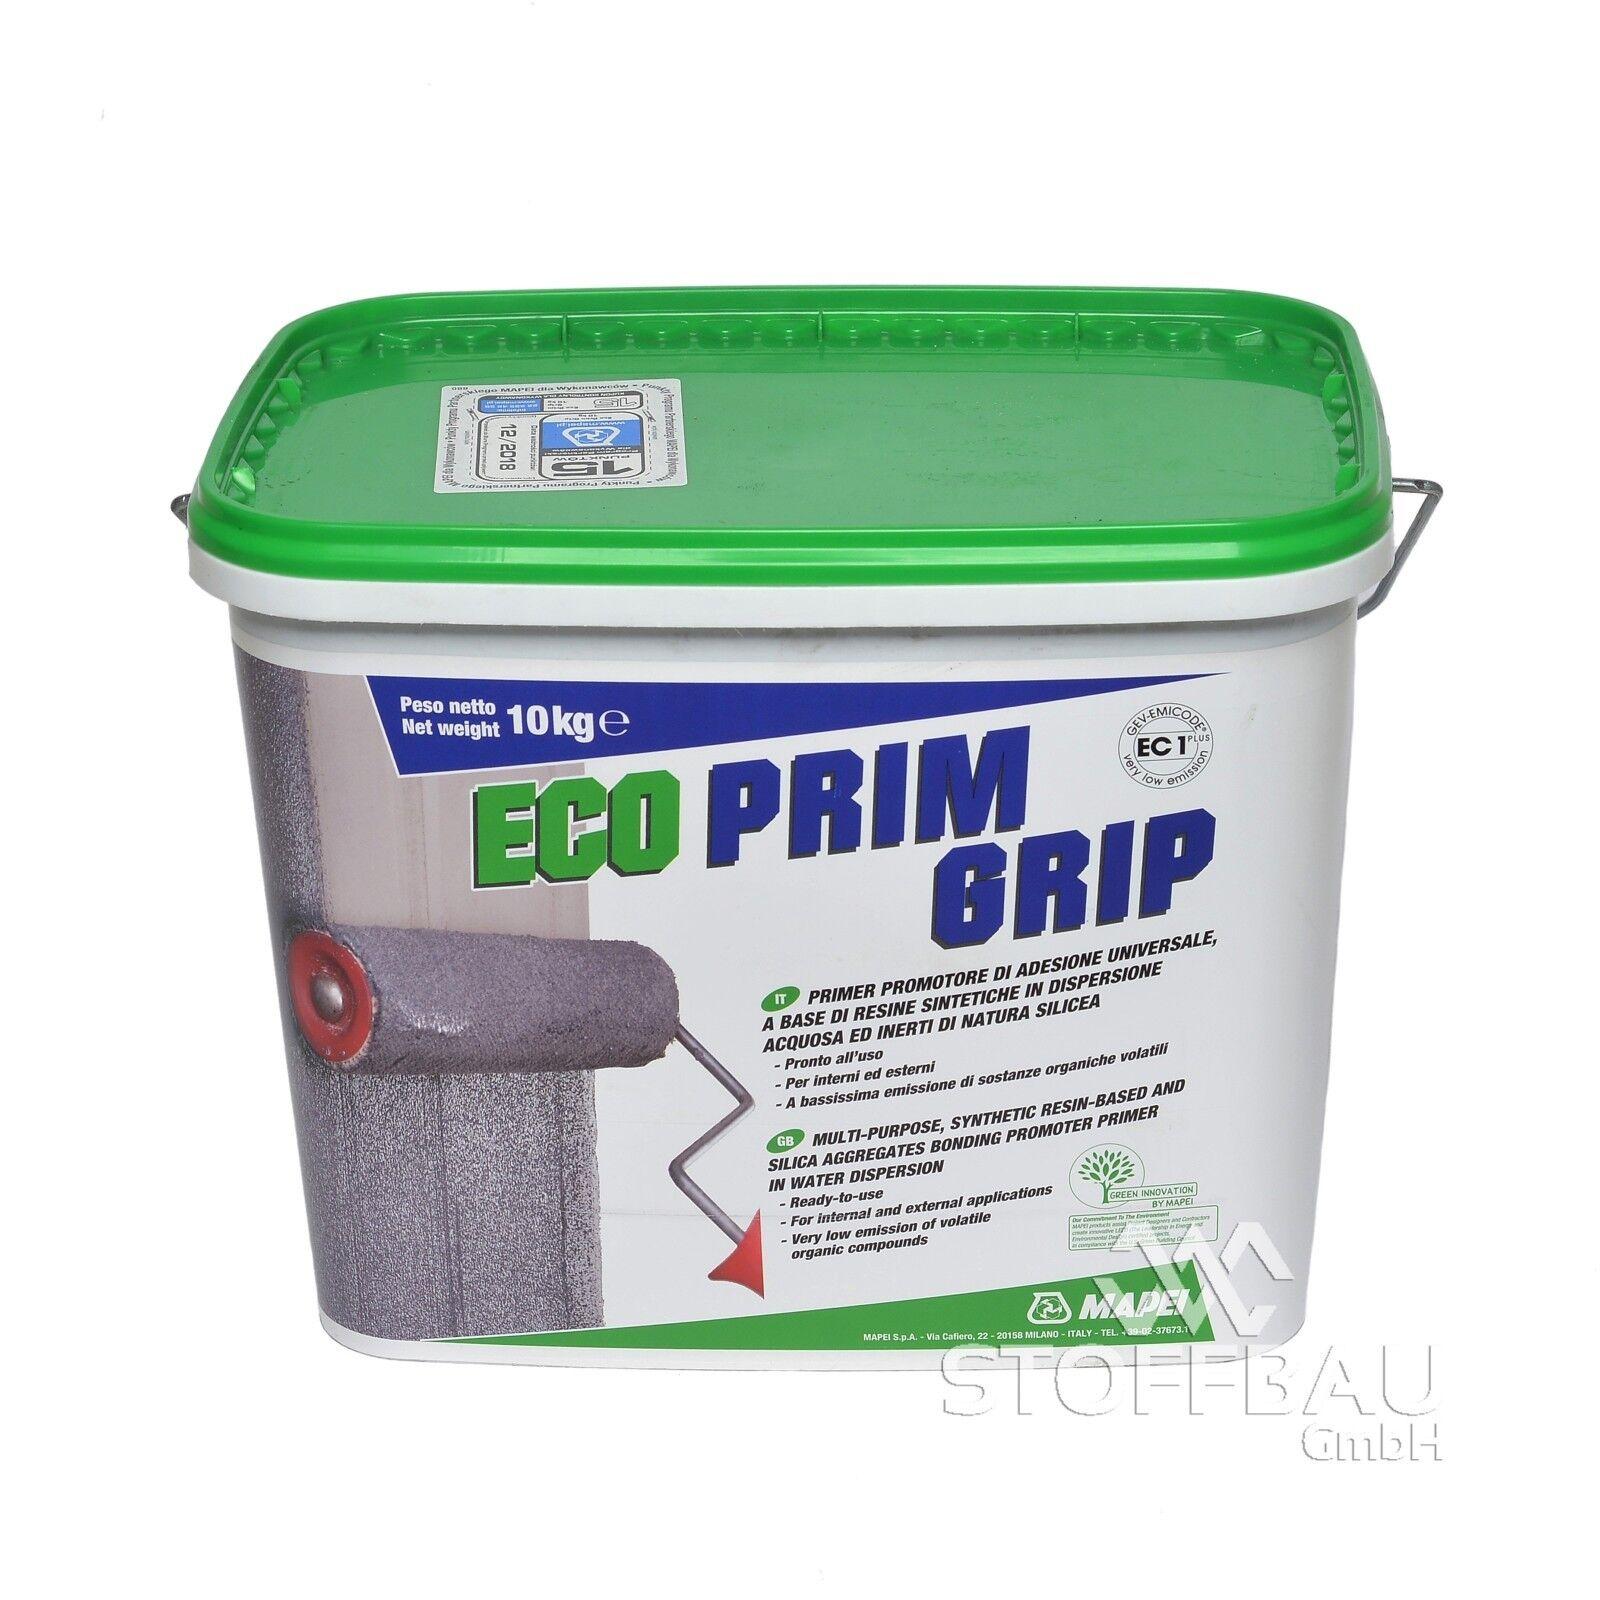 MAPEI ECO PRIM GRIP - Dispersionsgrundierung, 10 kg